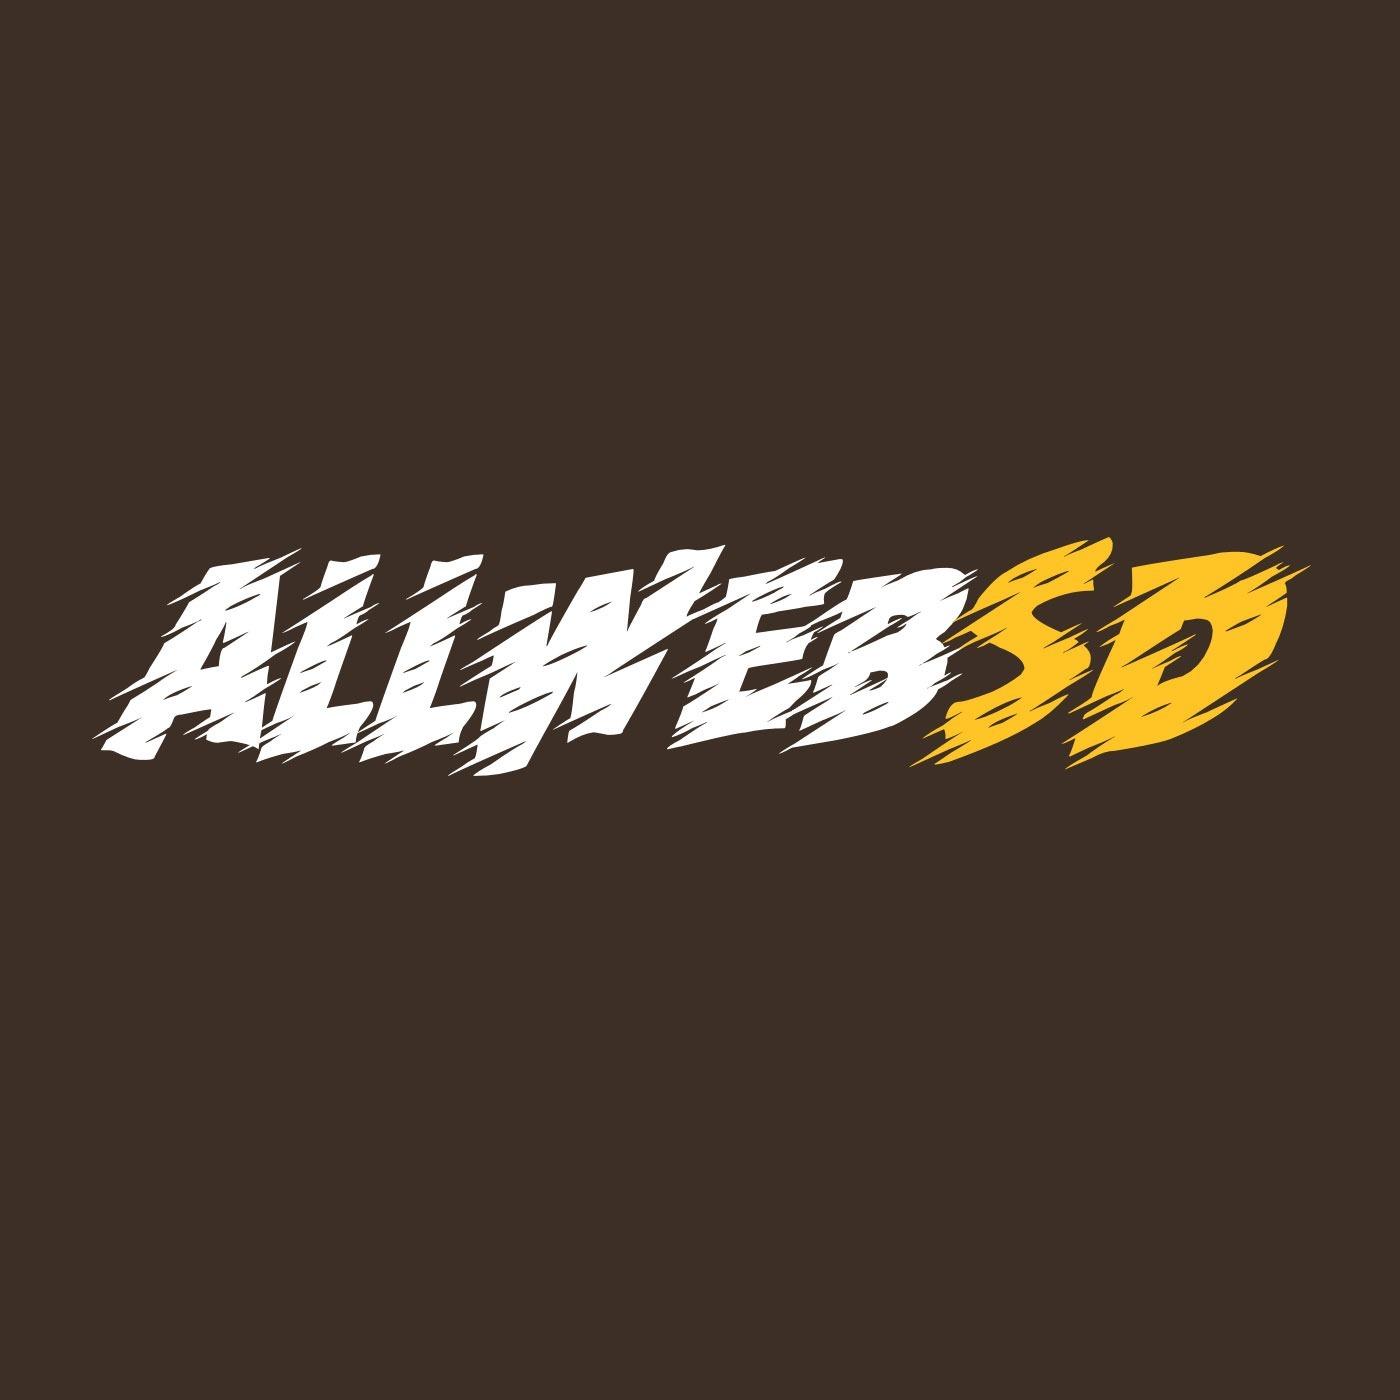 AllWebSD